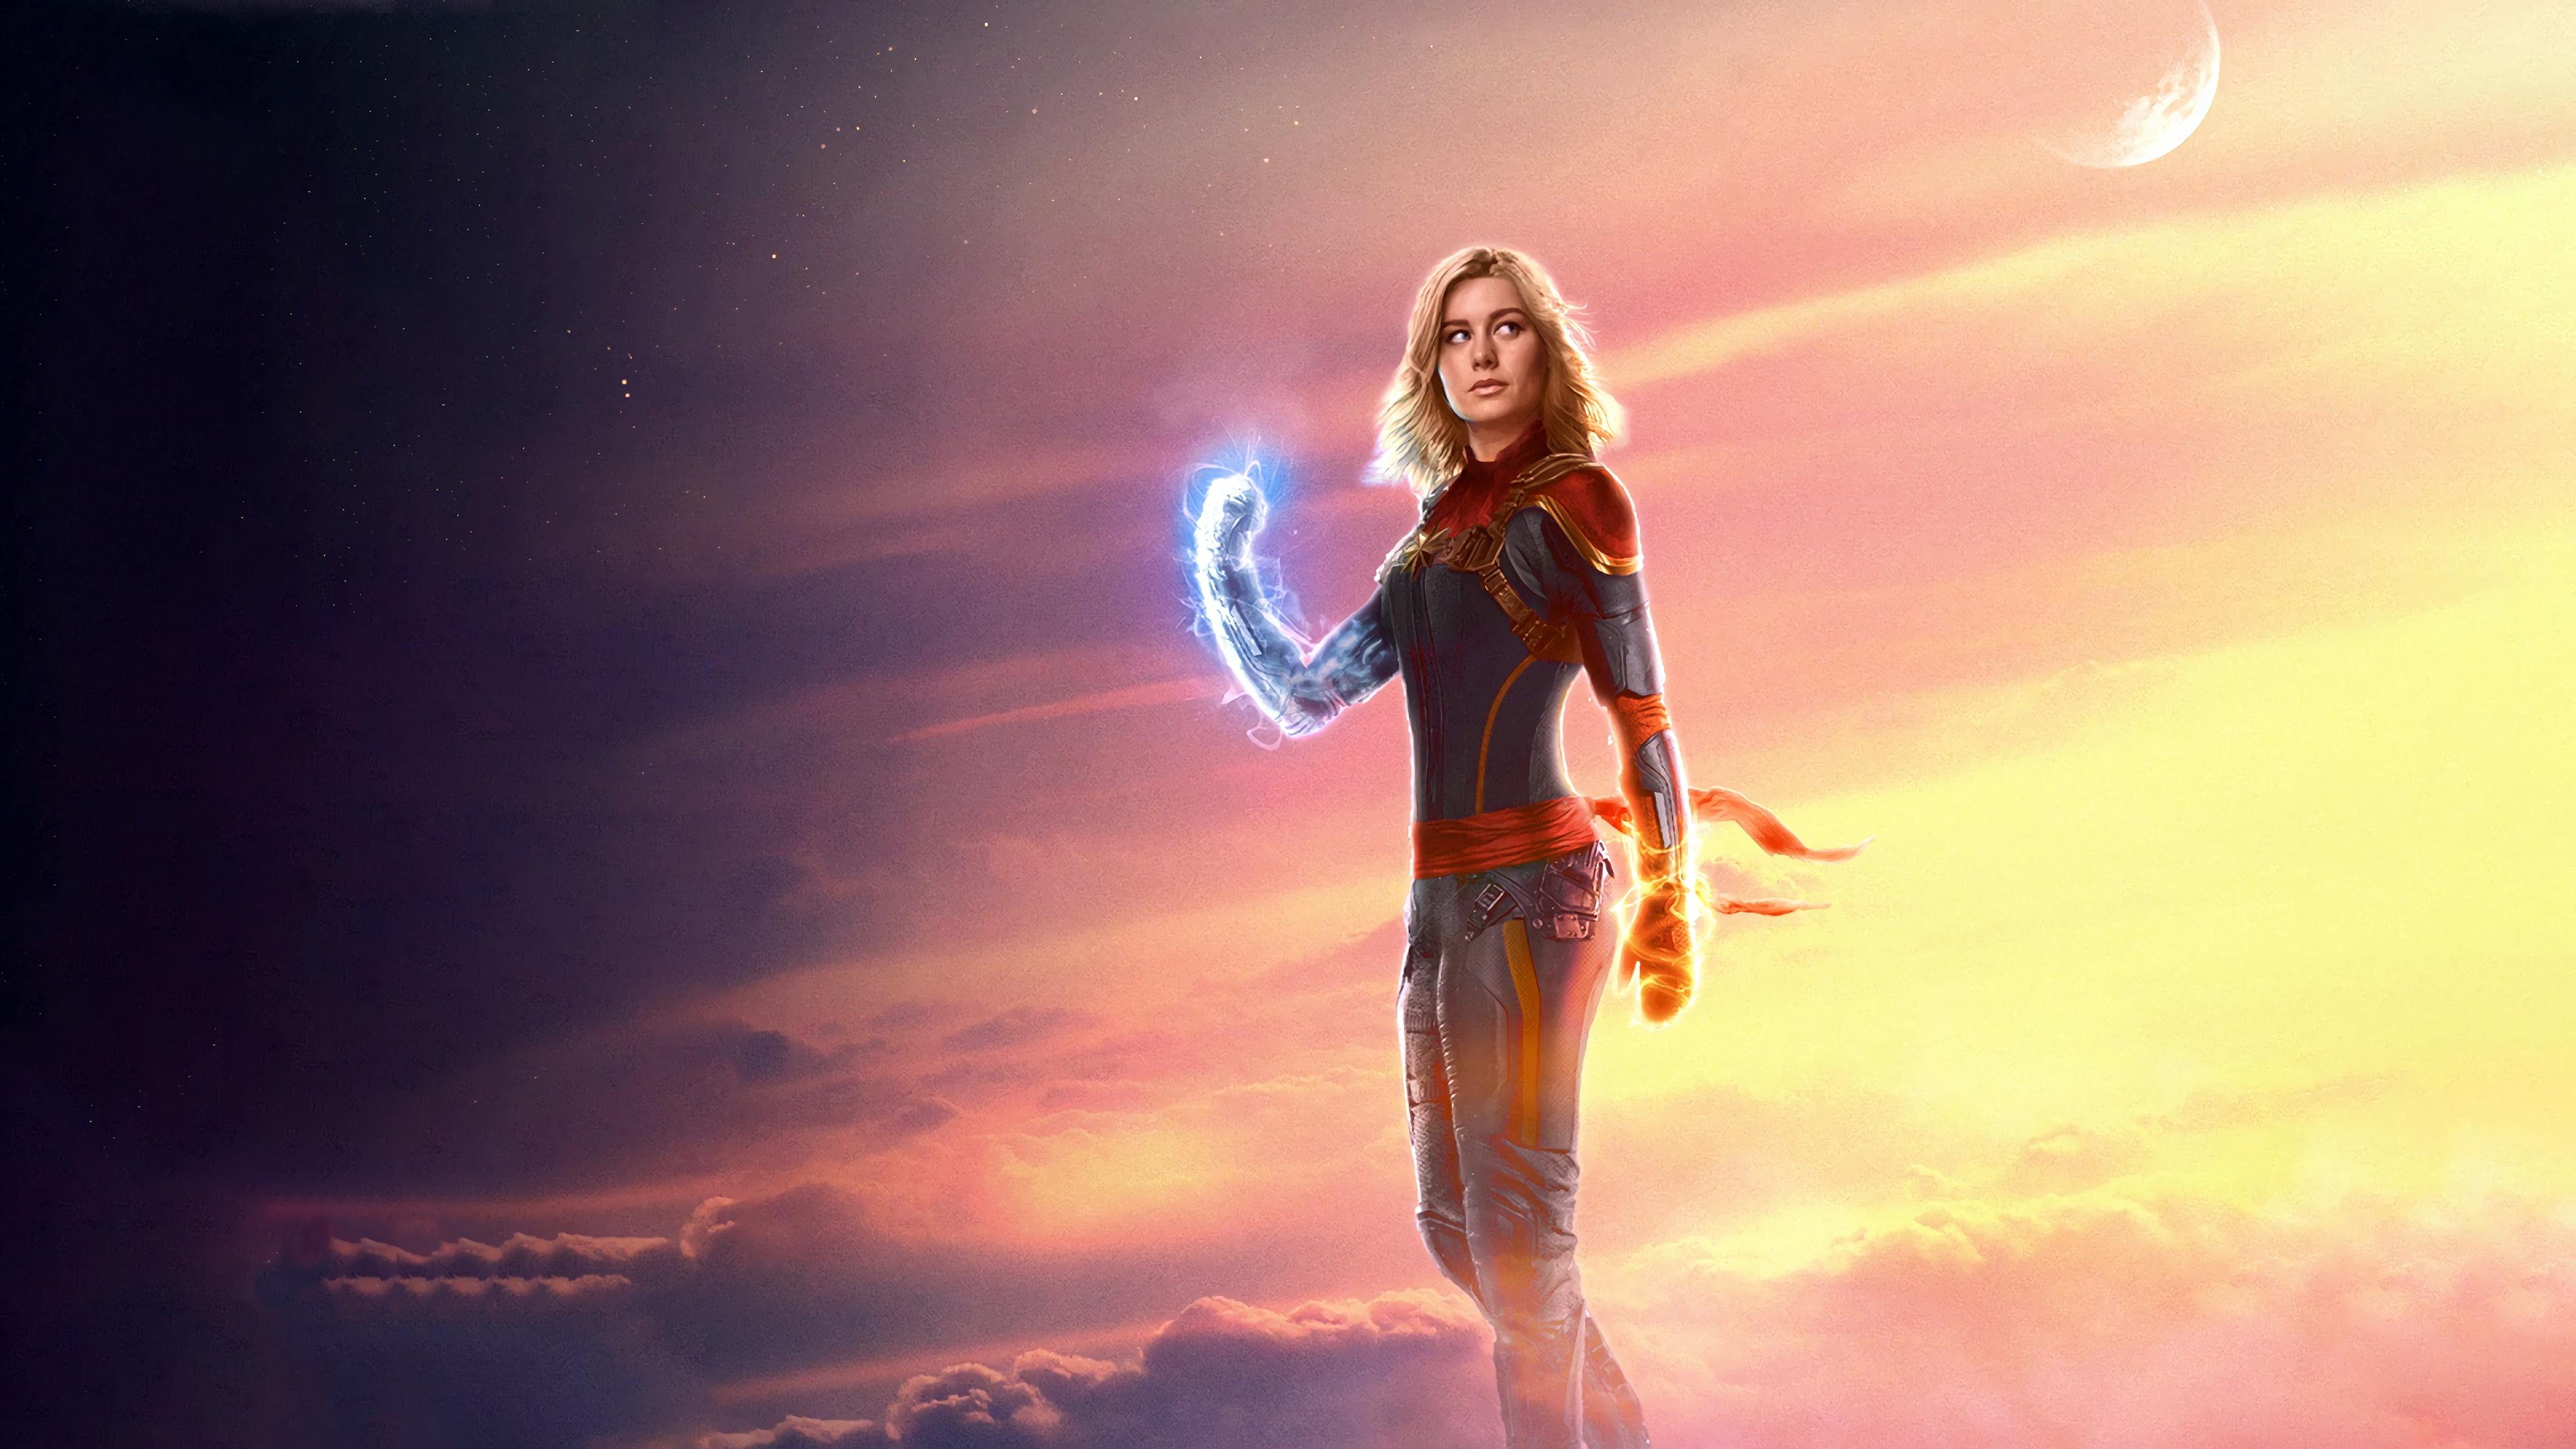 captain marvel carol danvers brie larson movie 2019 4k wallpaper 1544829433 - Captain Marvel Carol Danvers Brie Larson Movie 2019 4K Wallpaper - Captain Marvel (Movie 2019), Captain Marvel (Carol Danvers)